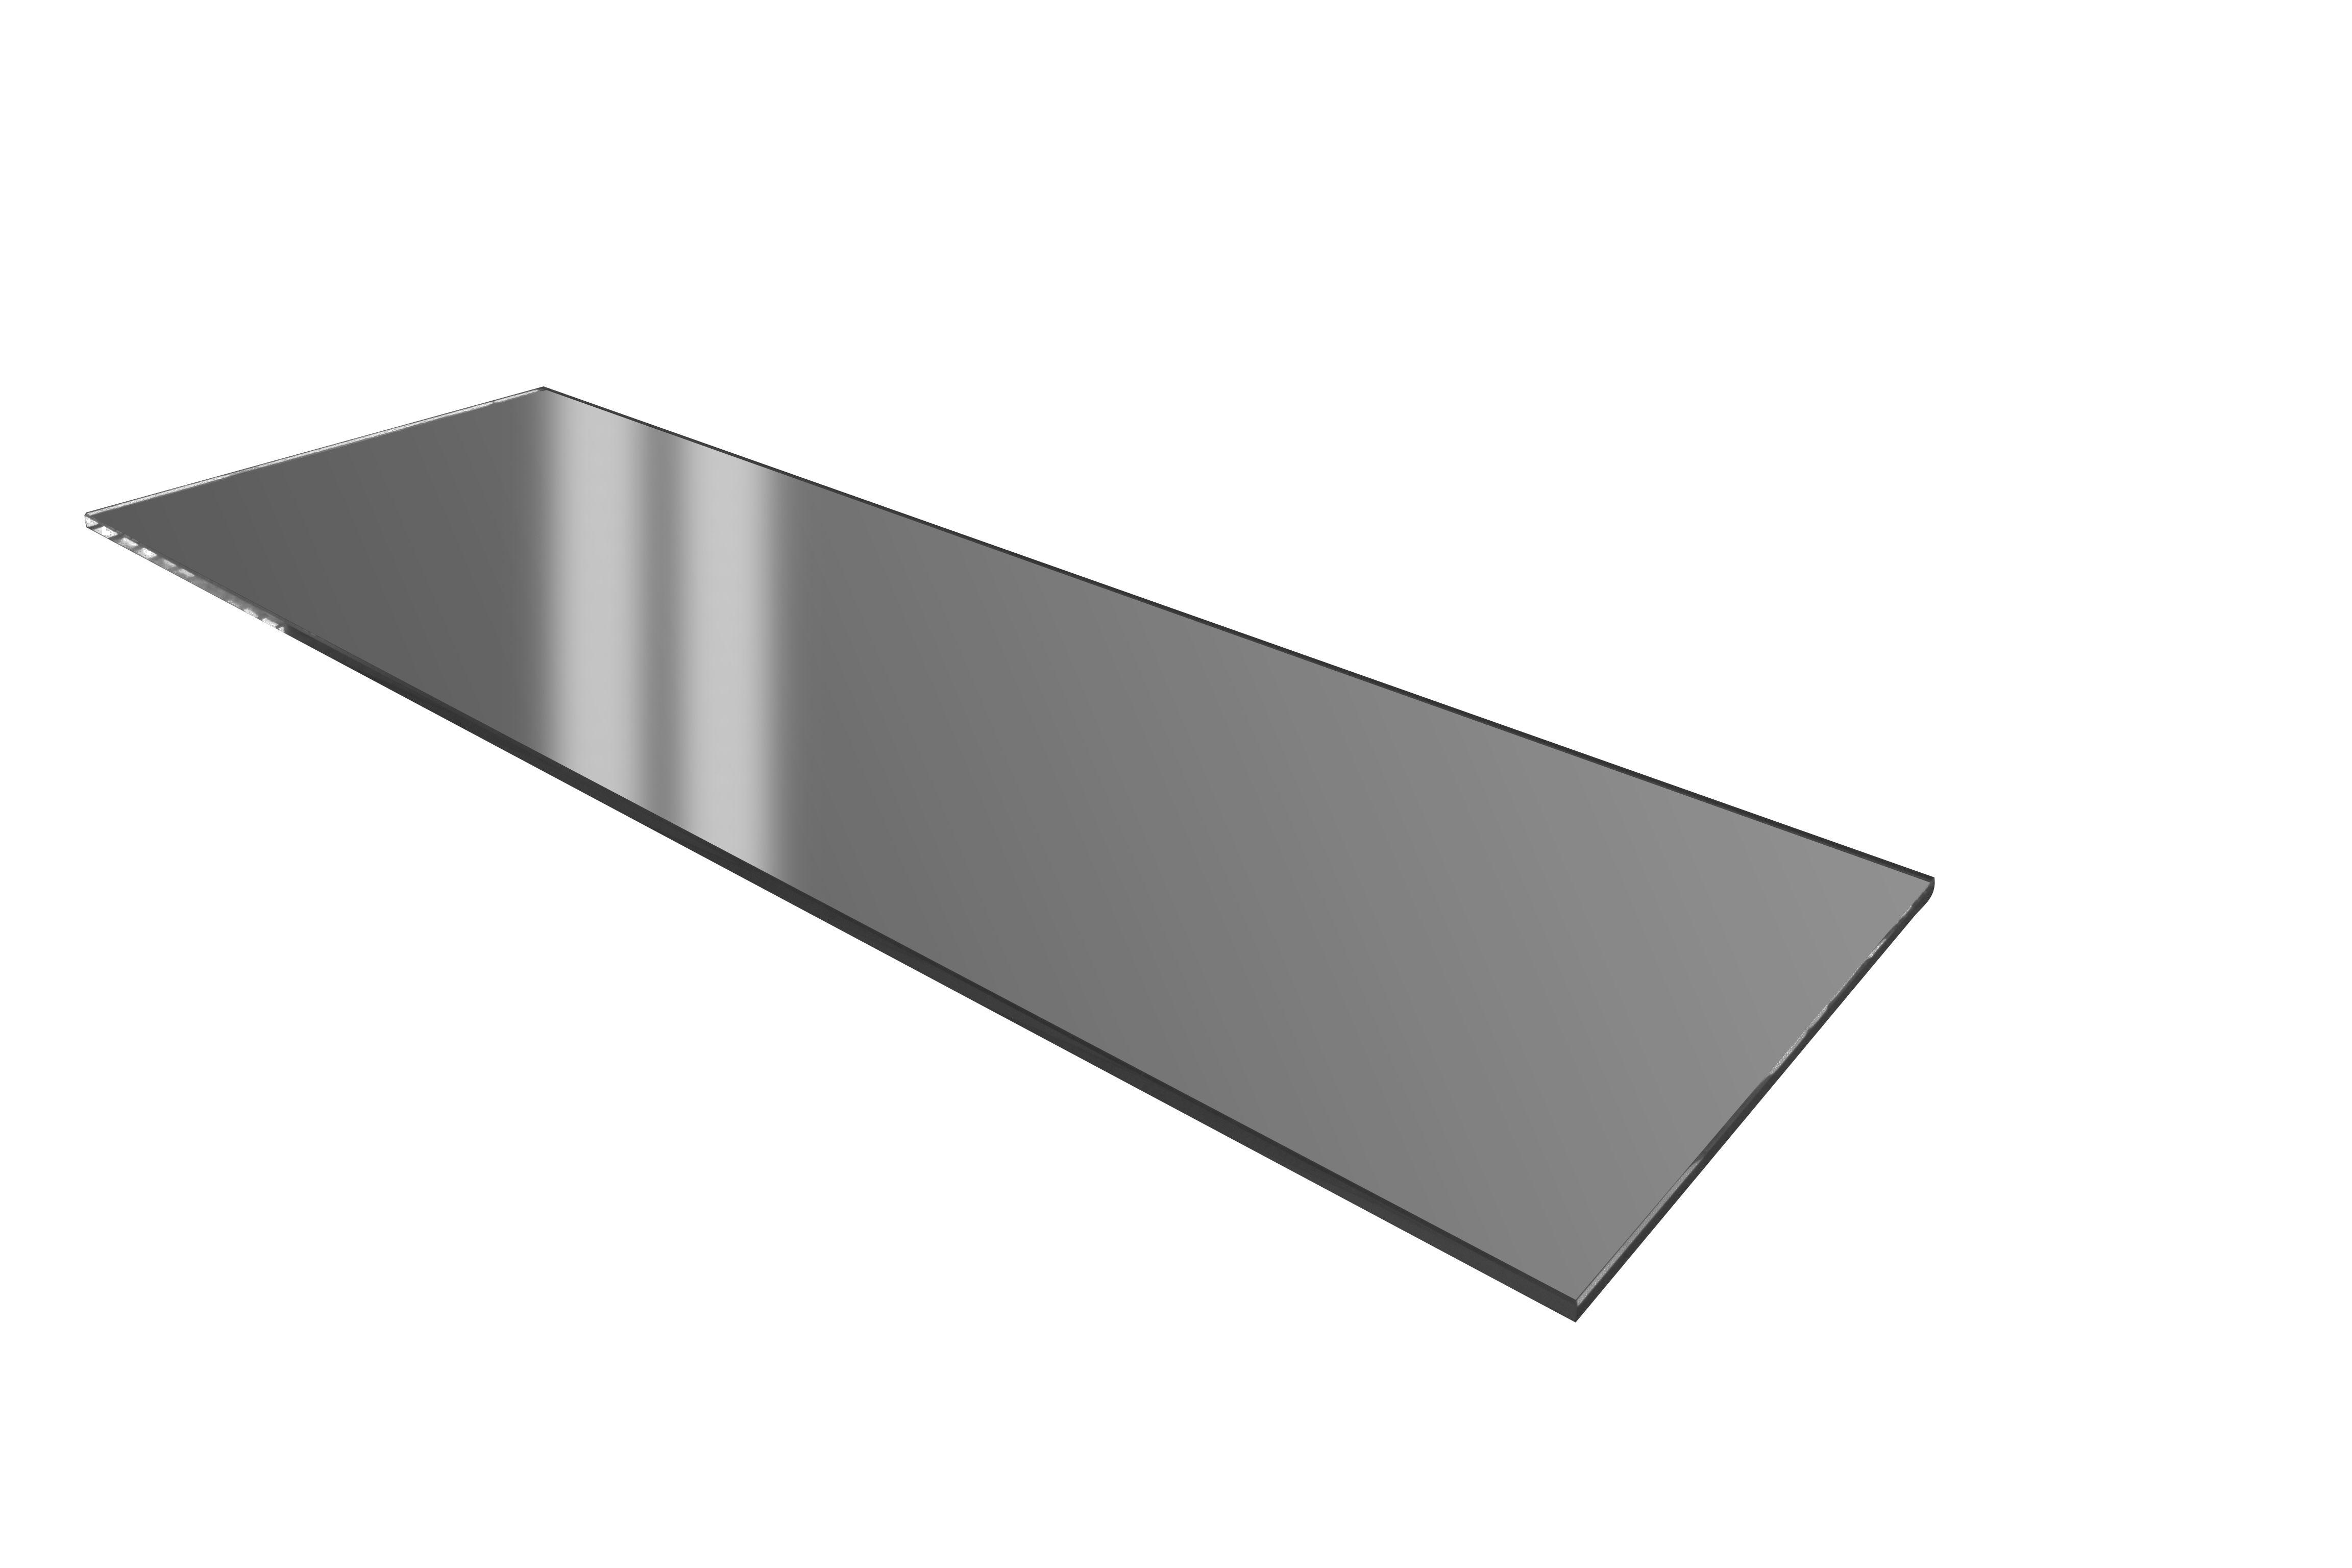 Tvrzené tmavé sklo GN 1/2 - Verlo